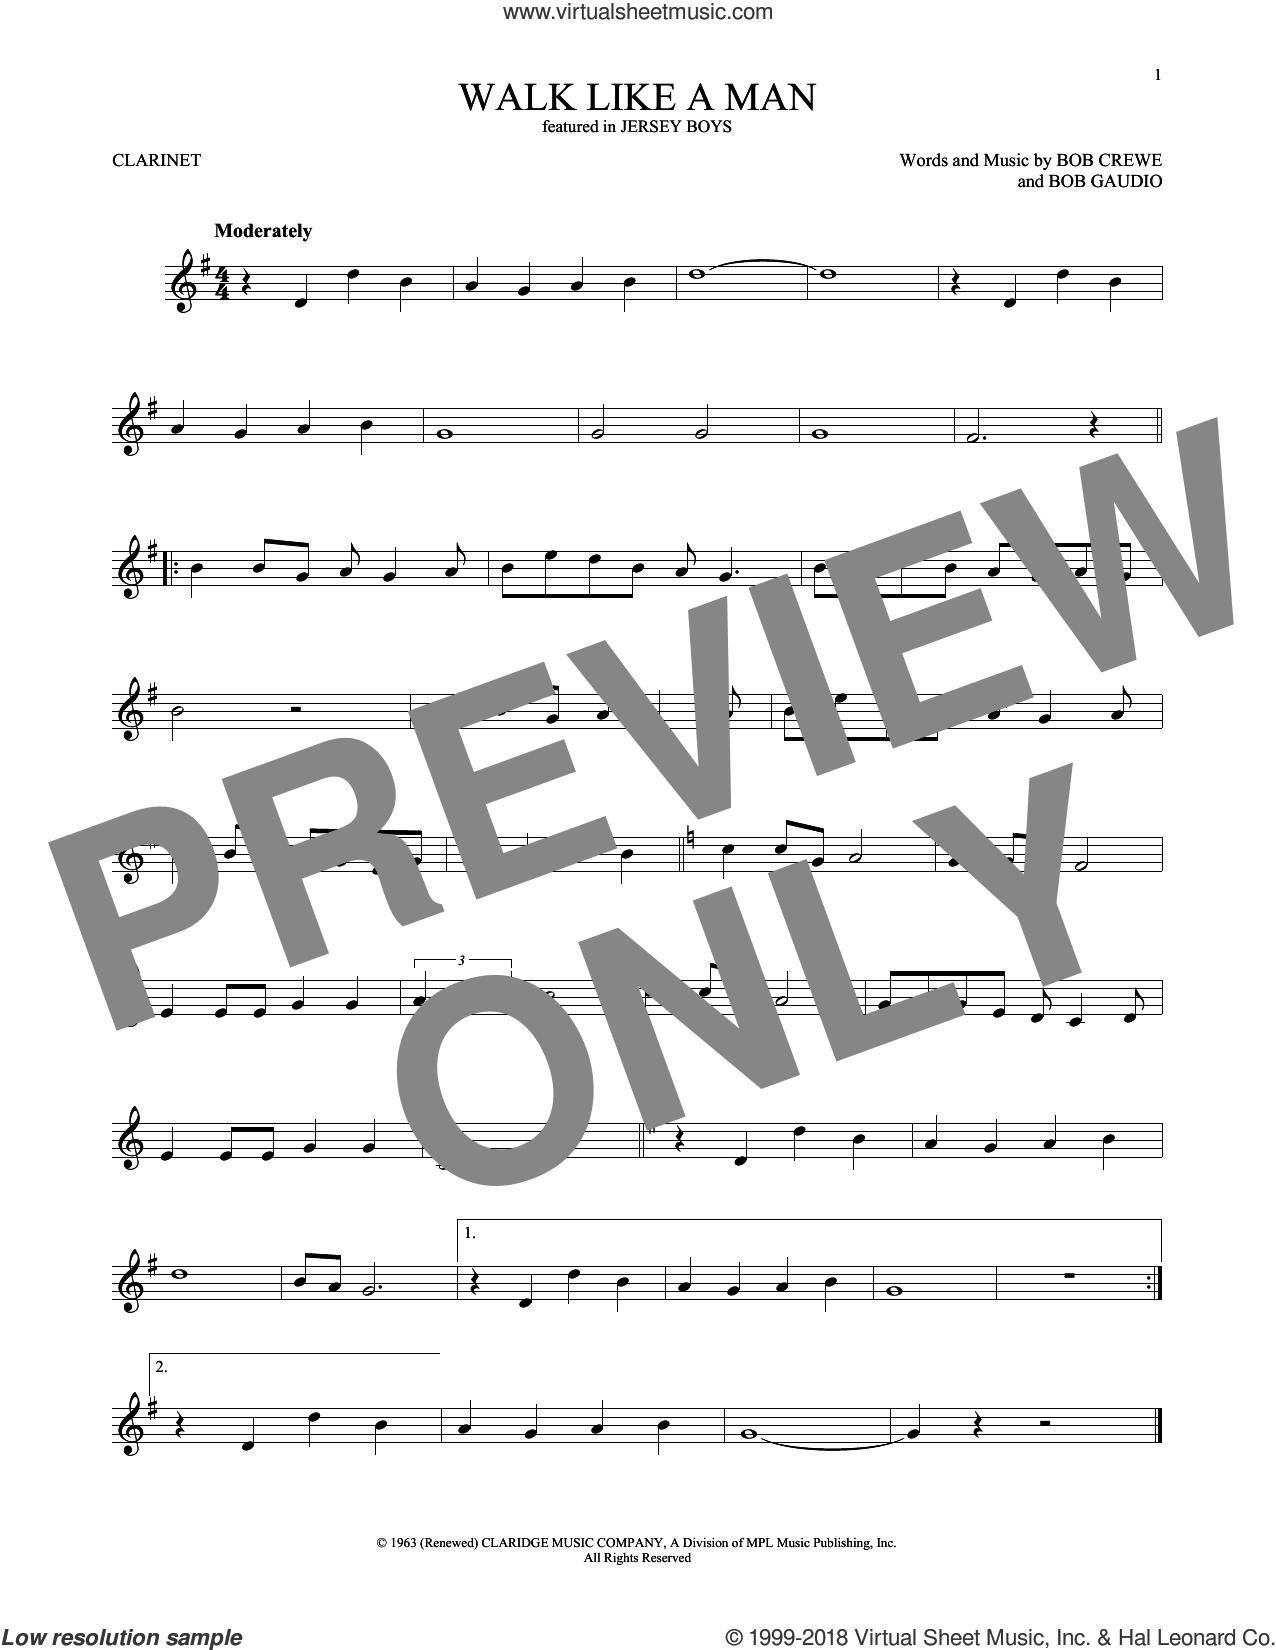 Walk Like A Man sheet music for clarinet solo by The Four Seasons, Bob Crewe and Bob Gaudio, intermediate skill level